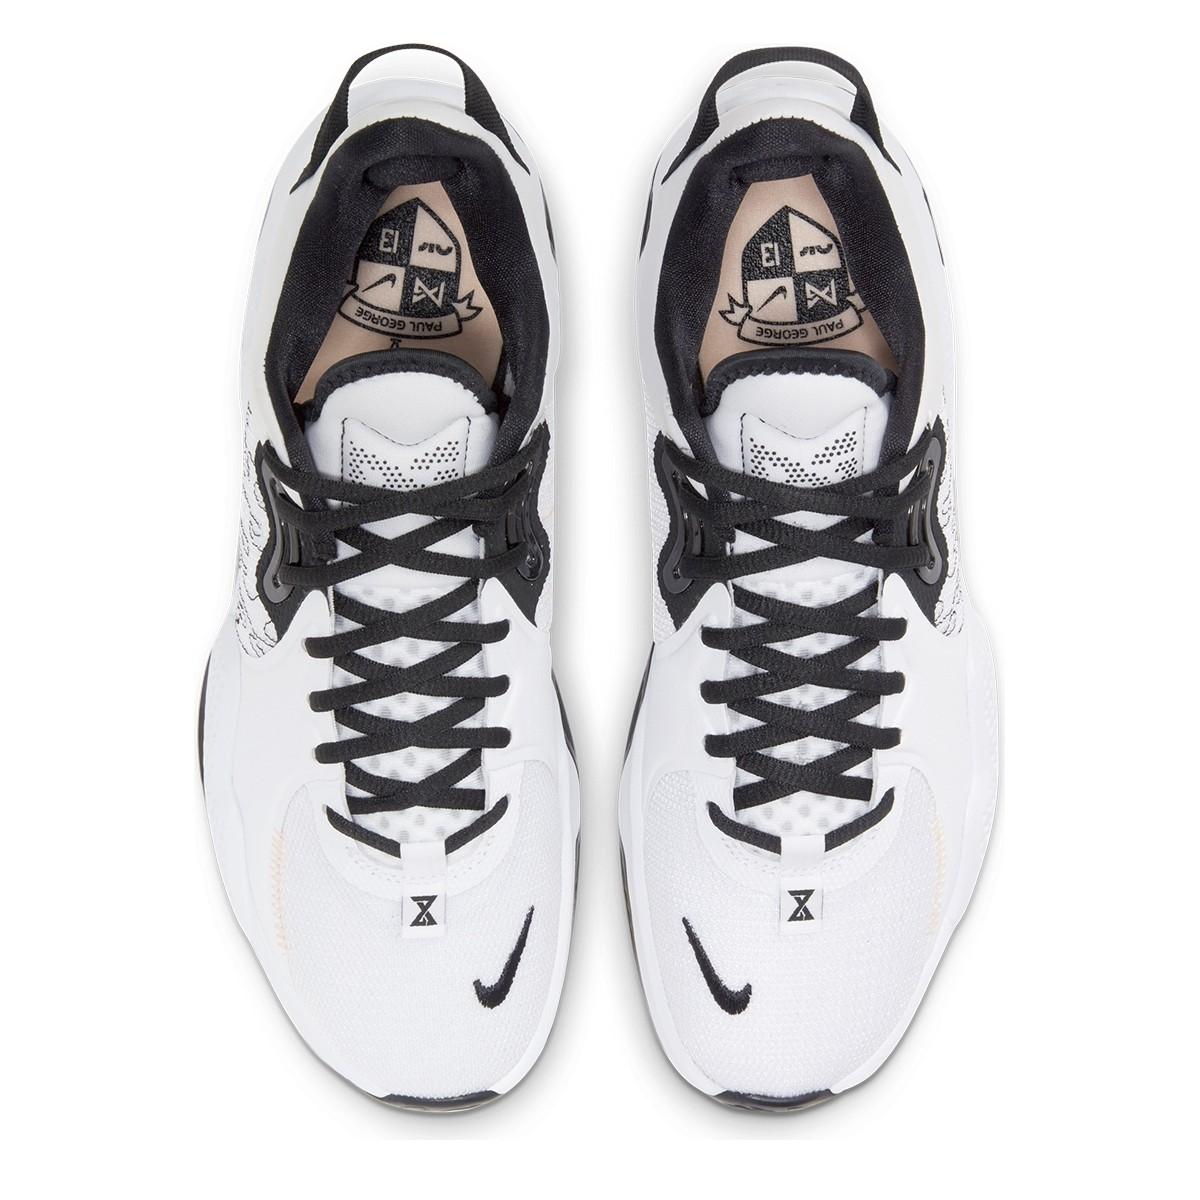 Nike PG 5 'White'-CW3143-100